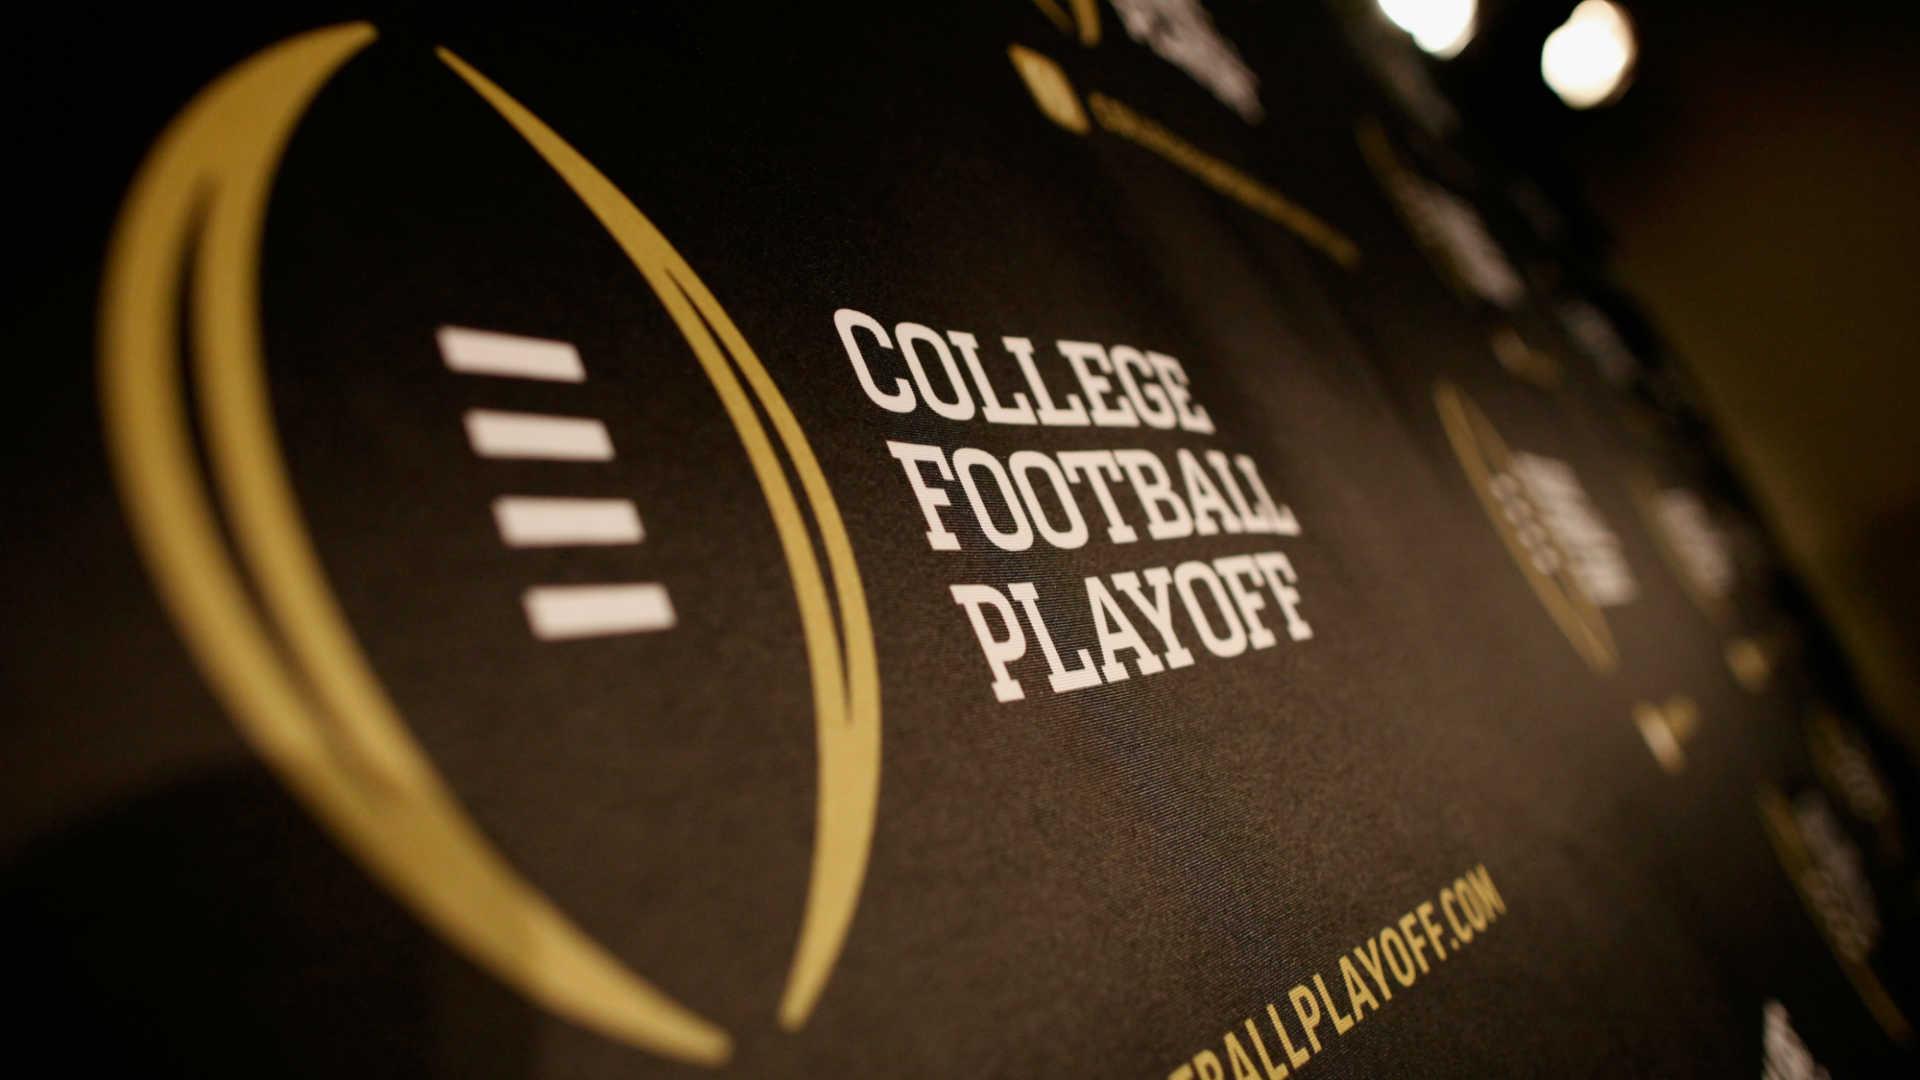 College-football-playoff-112016-getty-ftr_1p88r3q56wtnb11sfuuum4269v